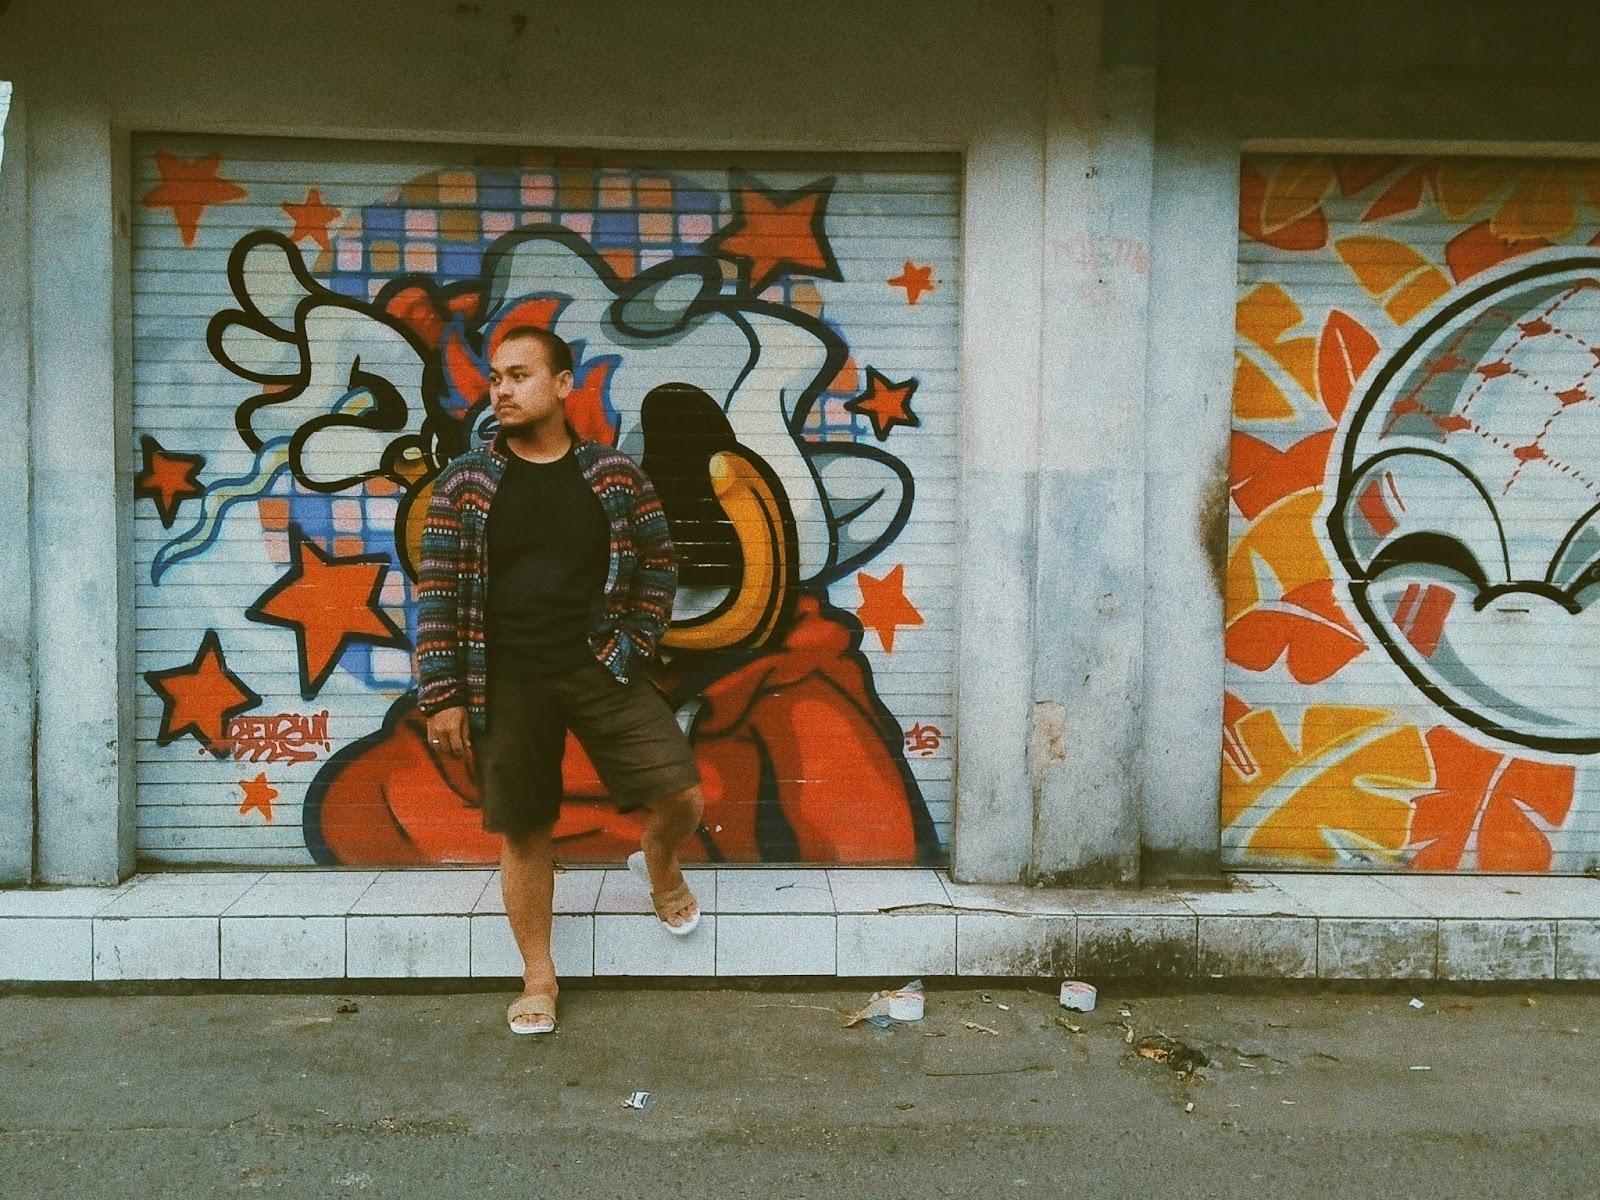 Menyusuri Prawirotaman Jogja : Hidup Ketika Pagi, Redup Kala Malam Menanti - Mural Prawirotaman